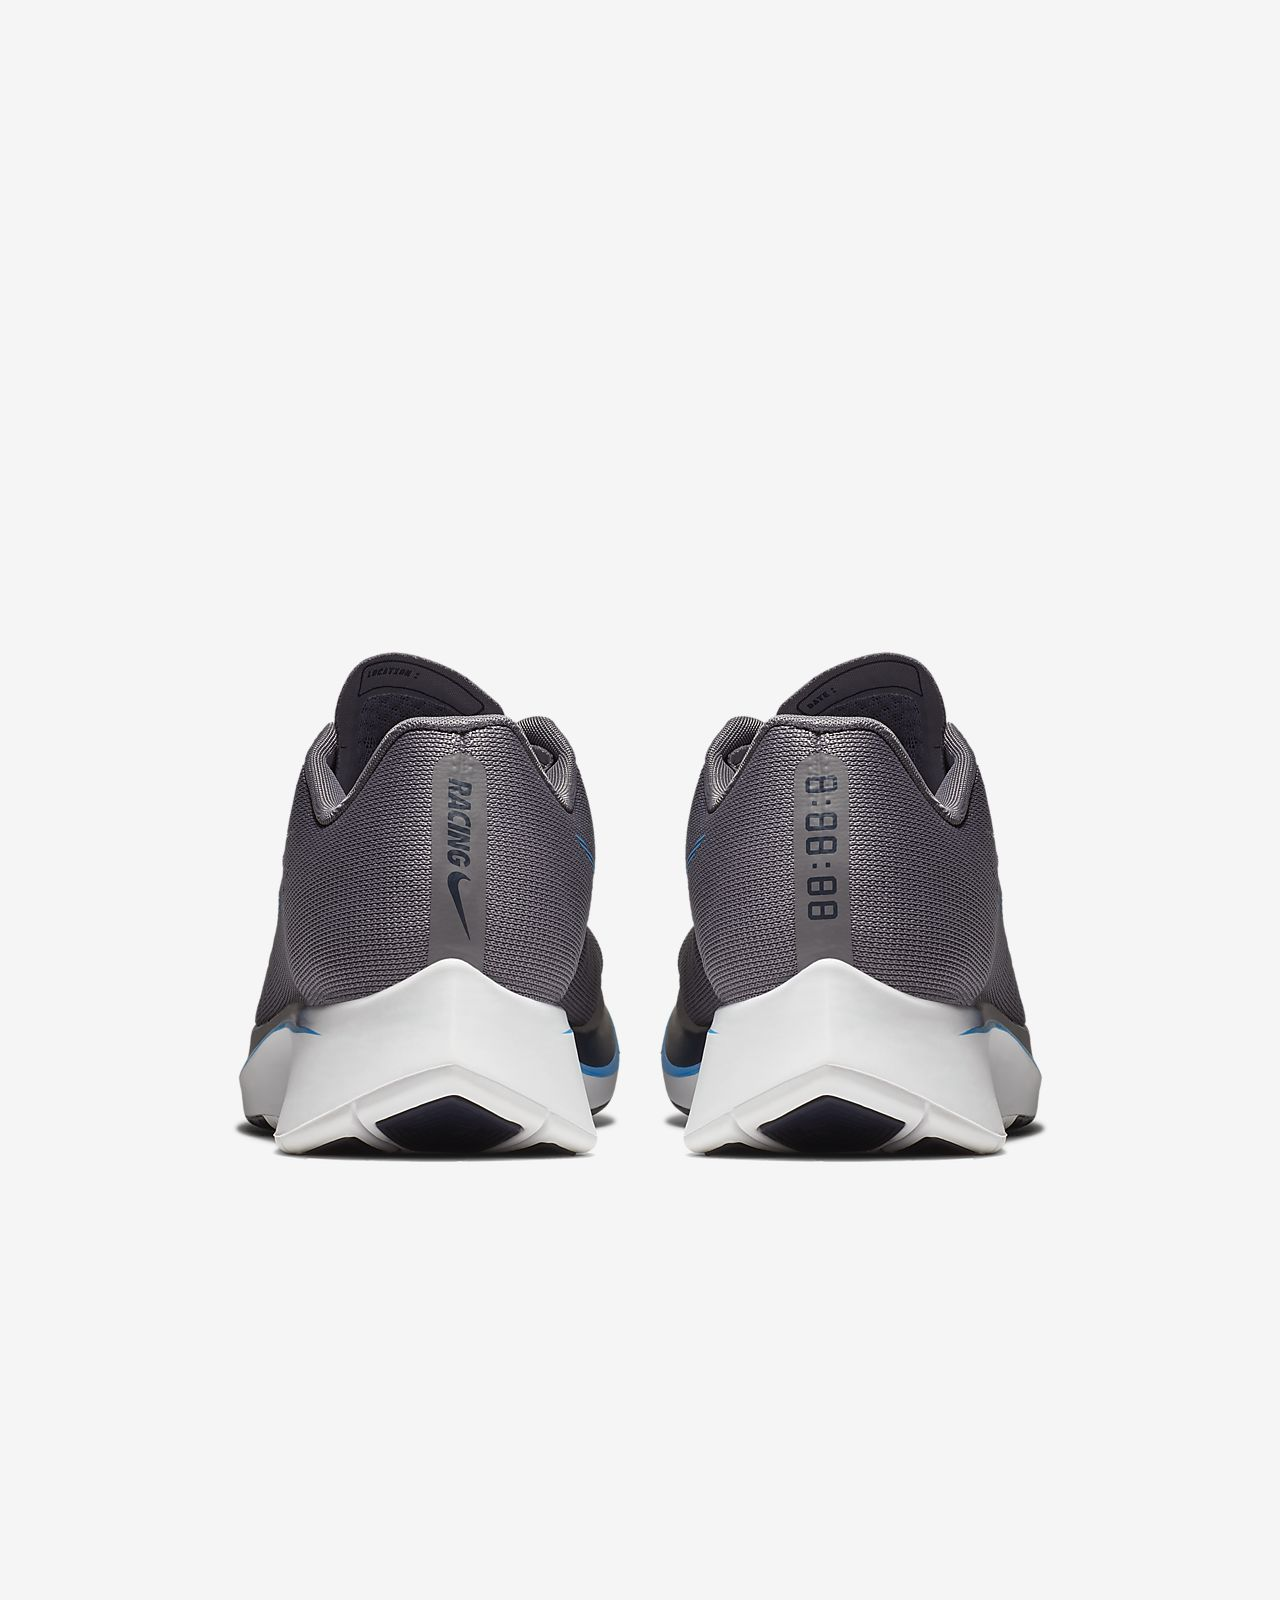 38f8a41600e91 Nike Zoom Fly Men s Running Shoe. Nike.com IN